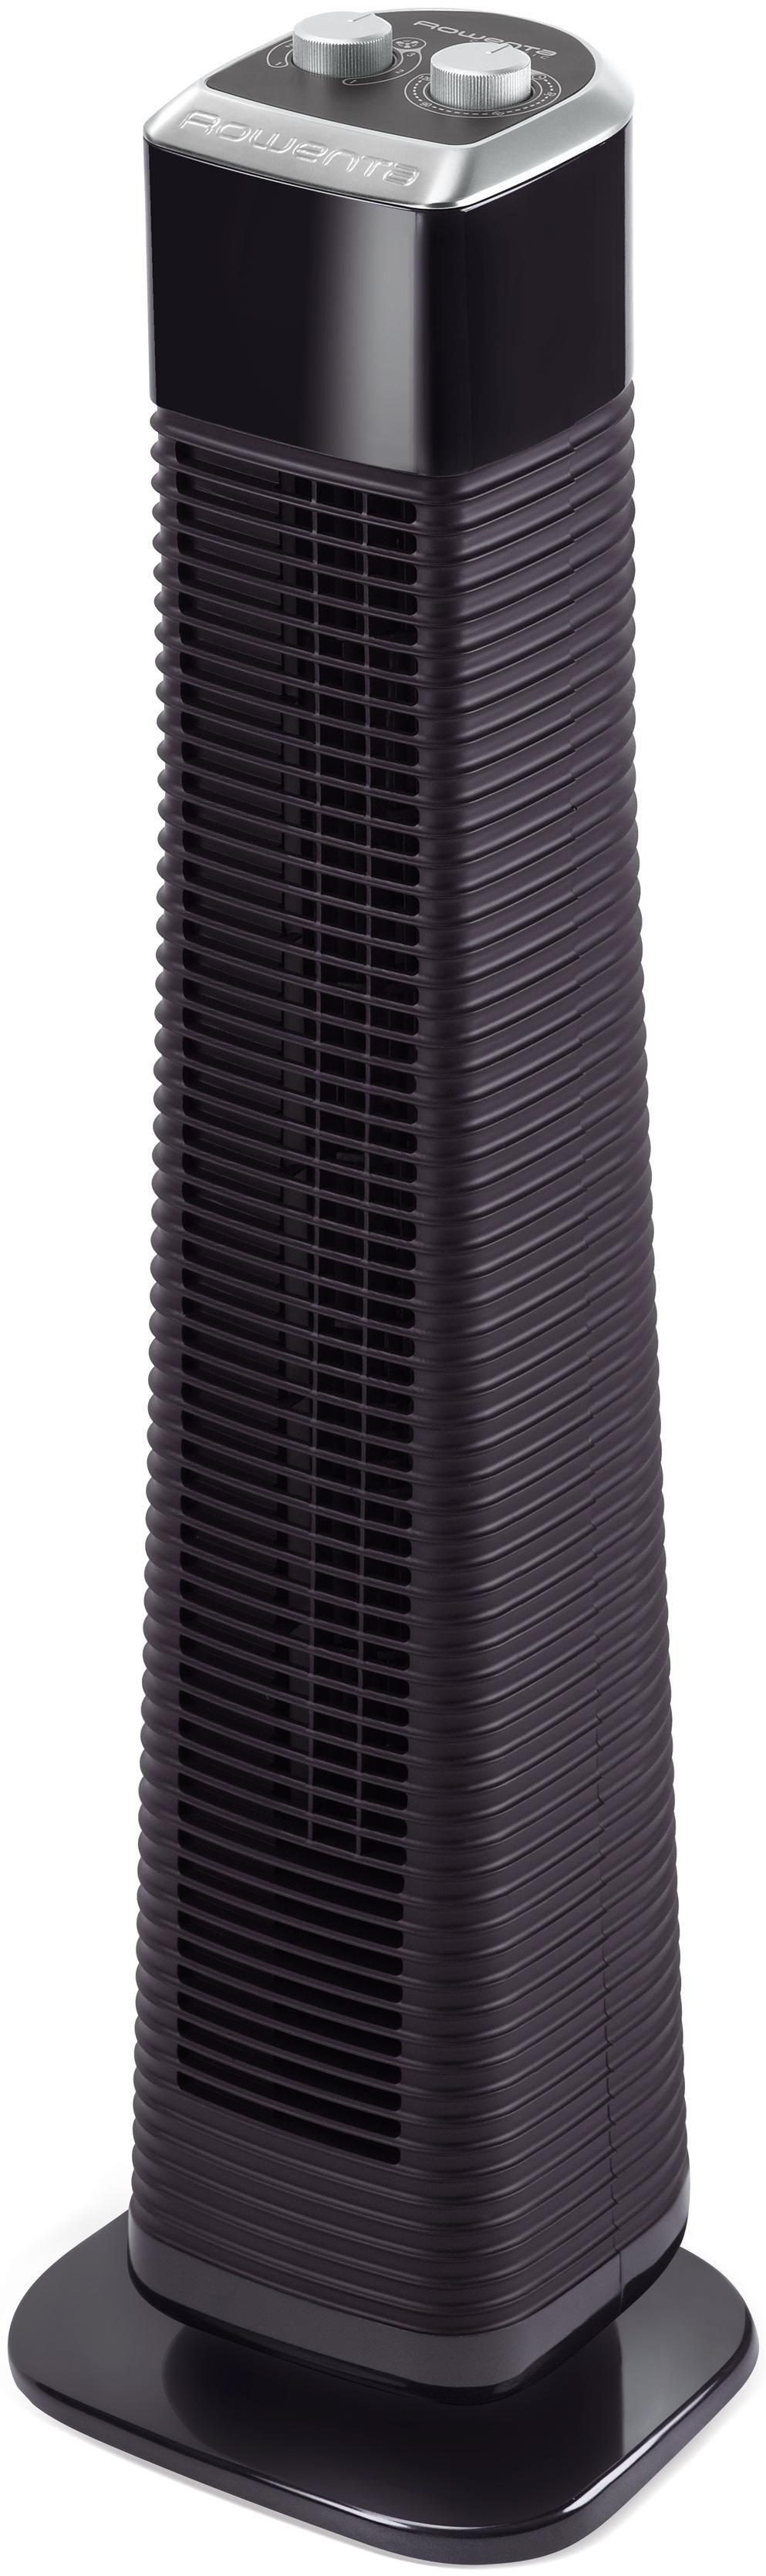 Rowenta VU6140 Classic Tower Turmventilator